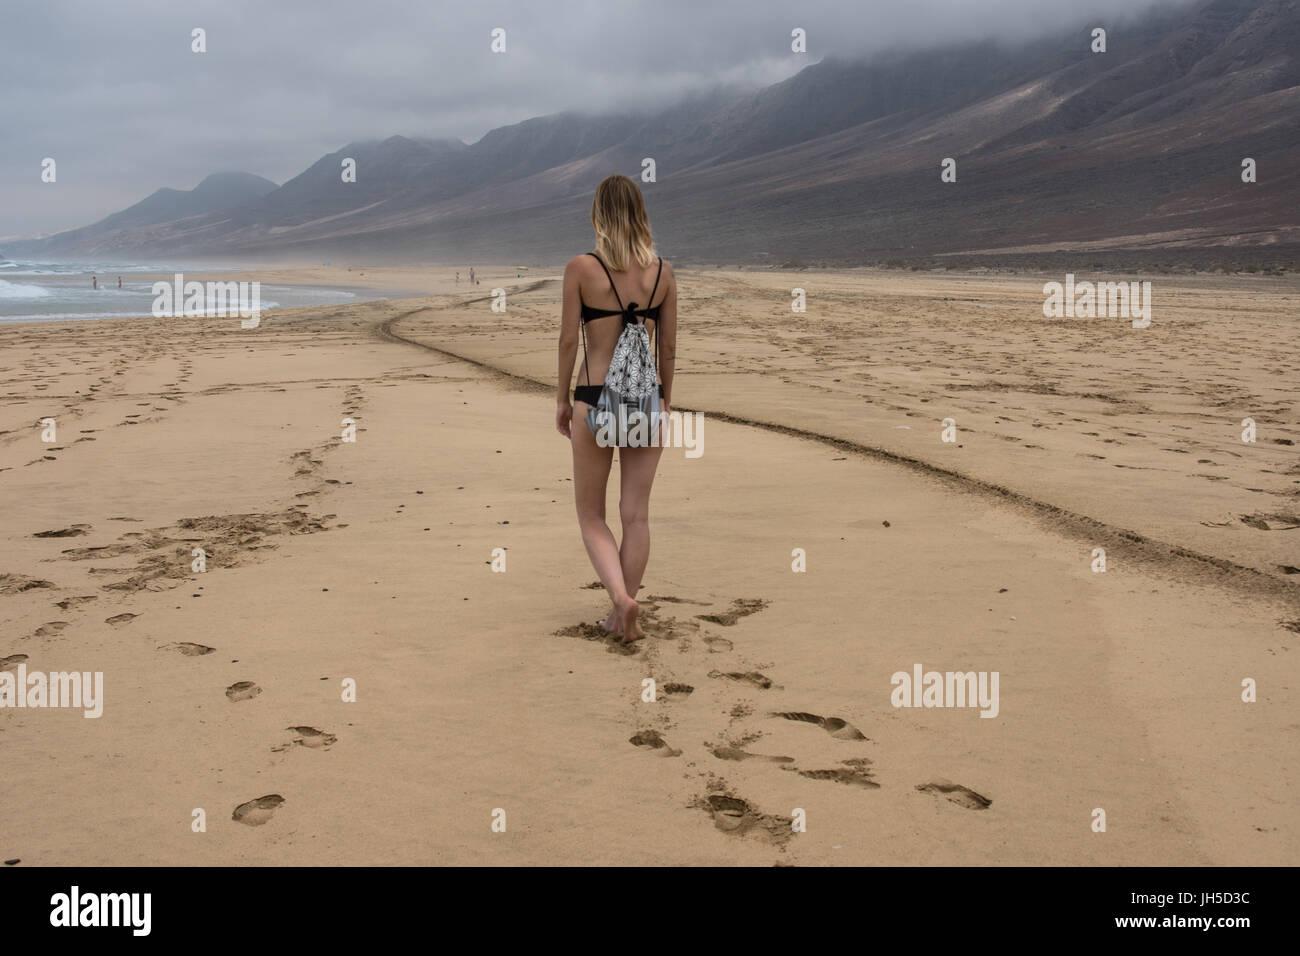 Fuerteventura - Canary Island - Stock Image